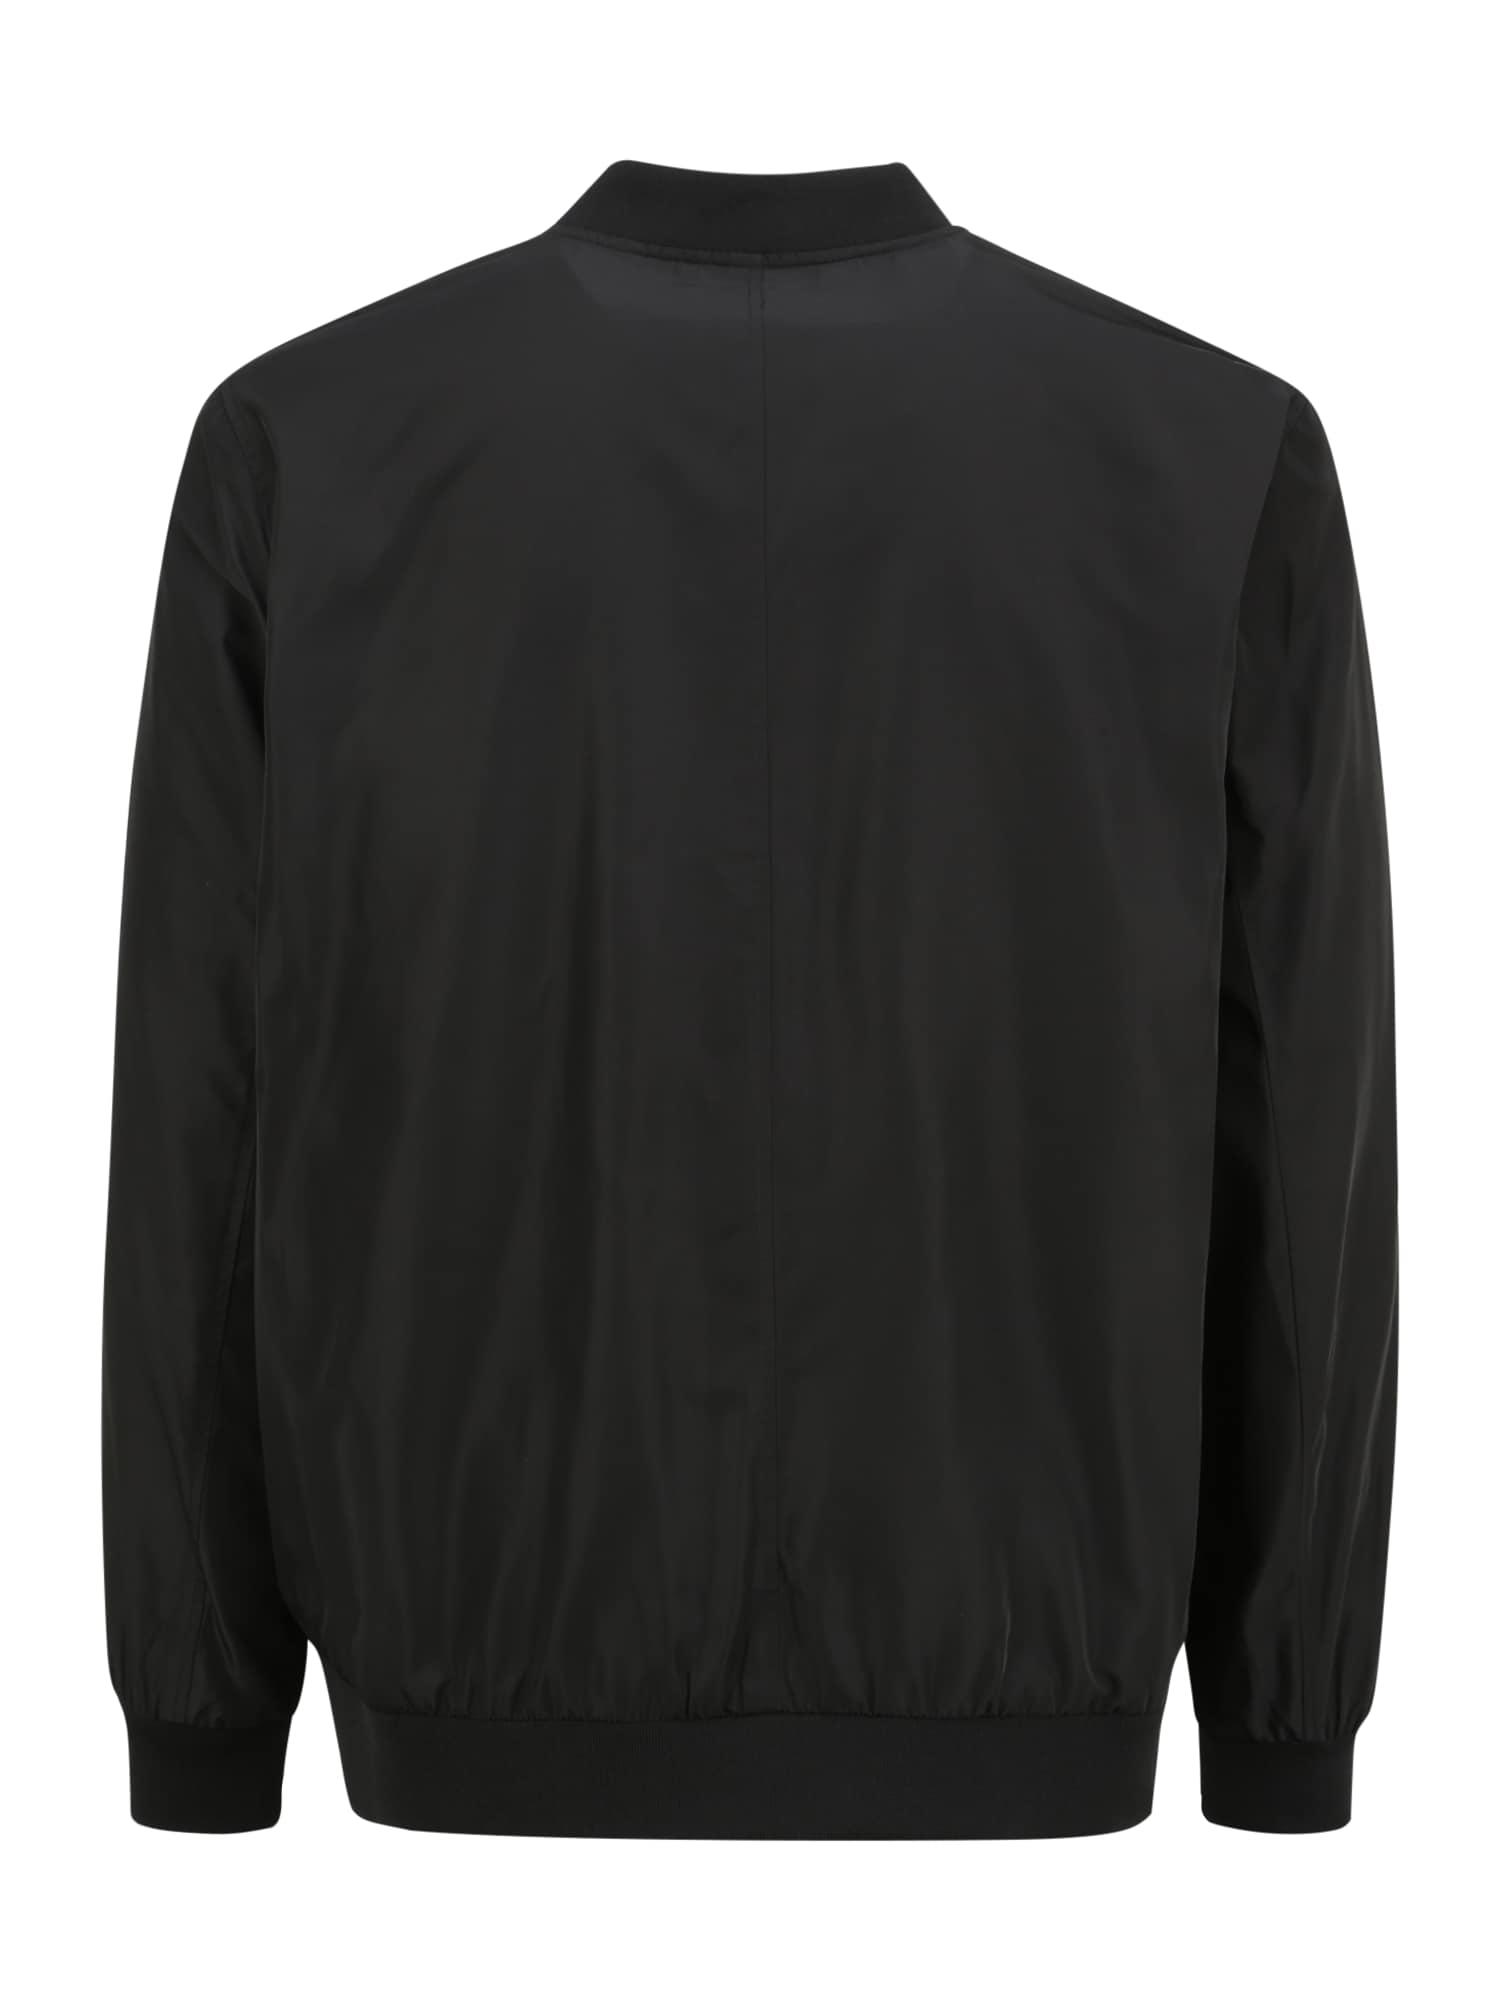 burton menswear london (big & tall) - Bomberjacke 'CORE'